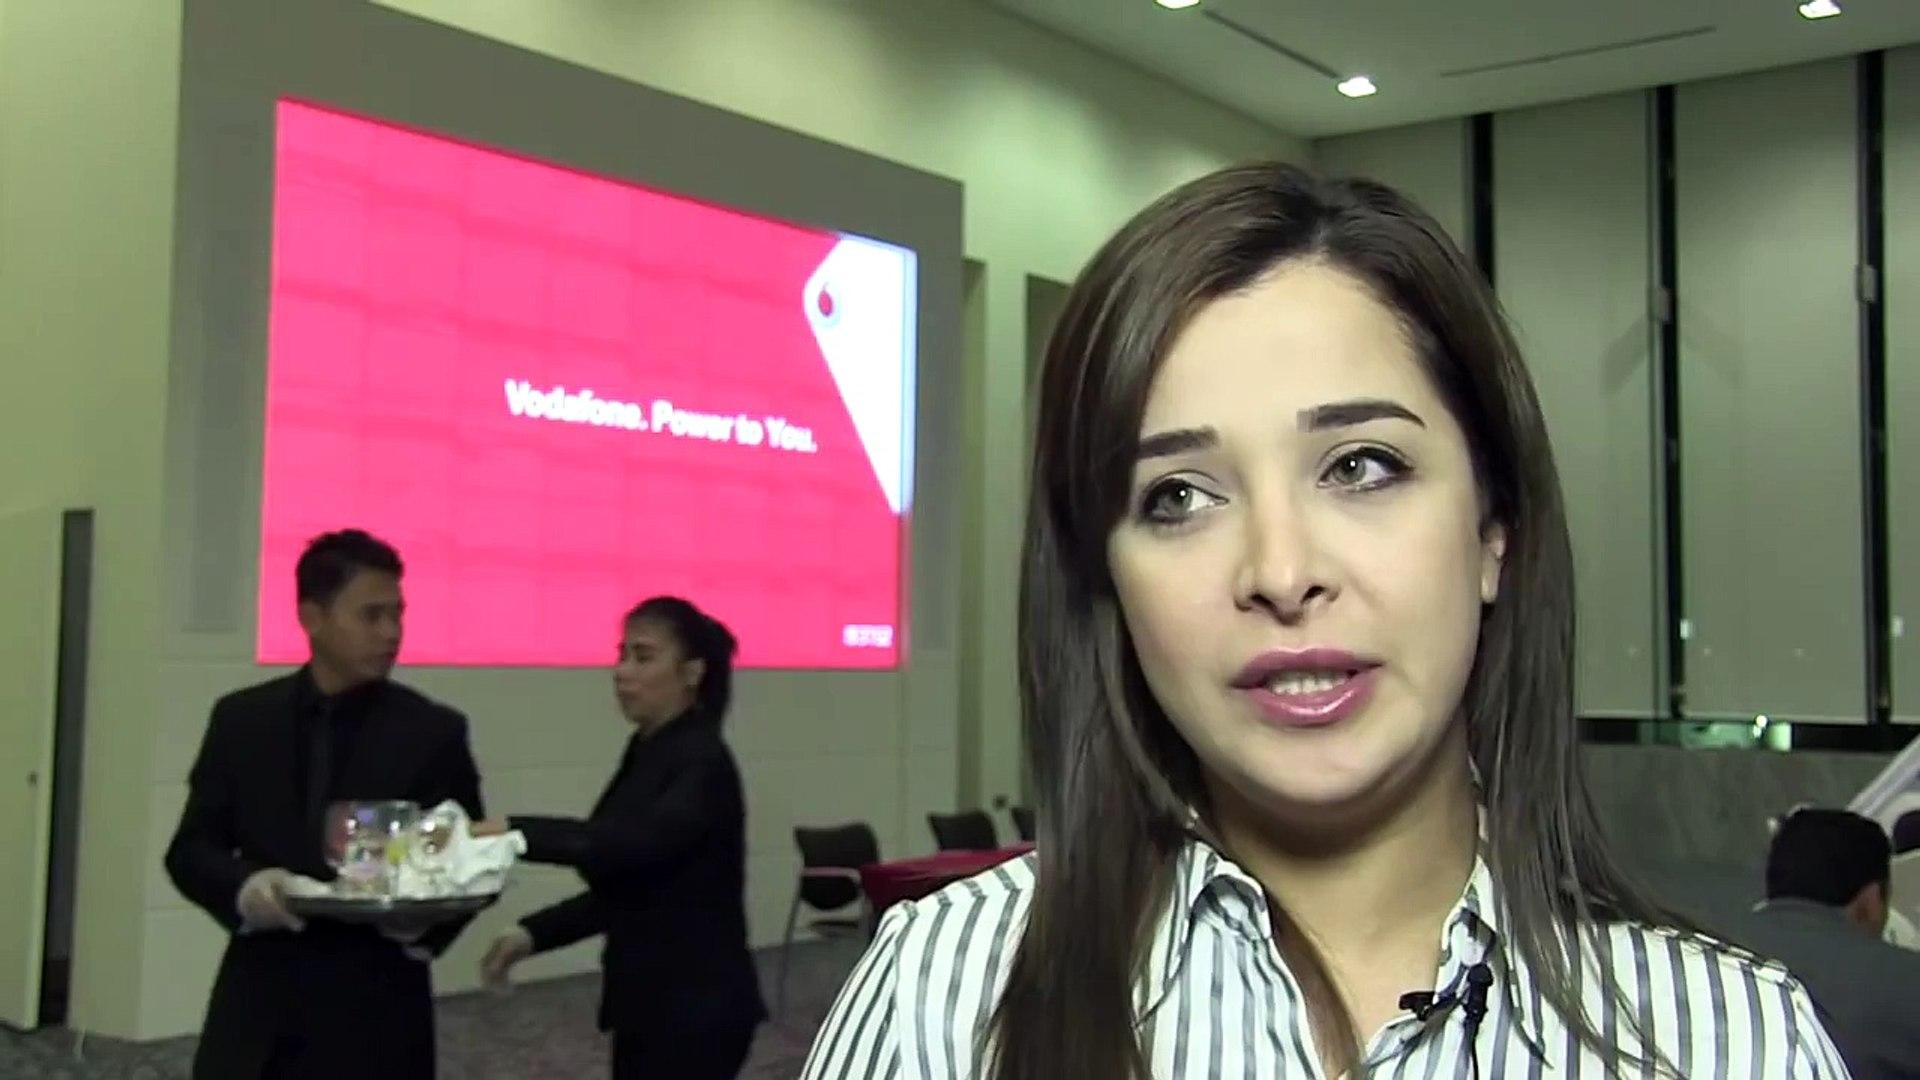 Vodafone Qatar | Voice of People; Qatar University event attendees